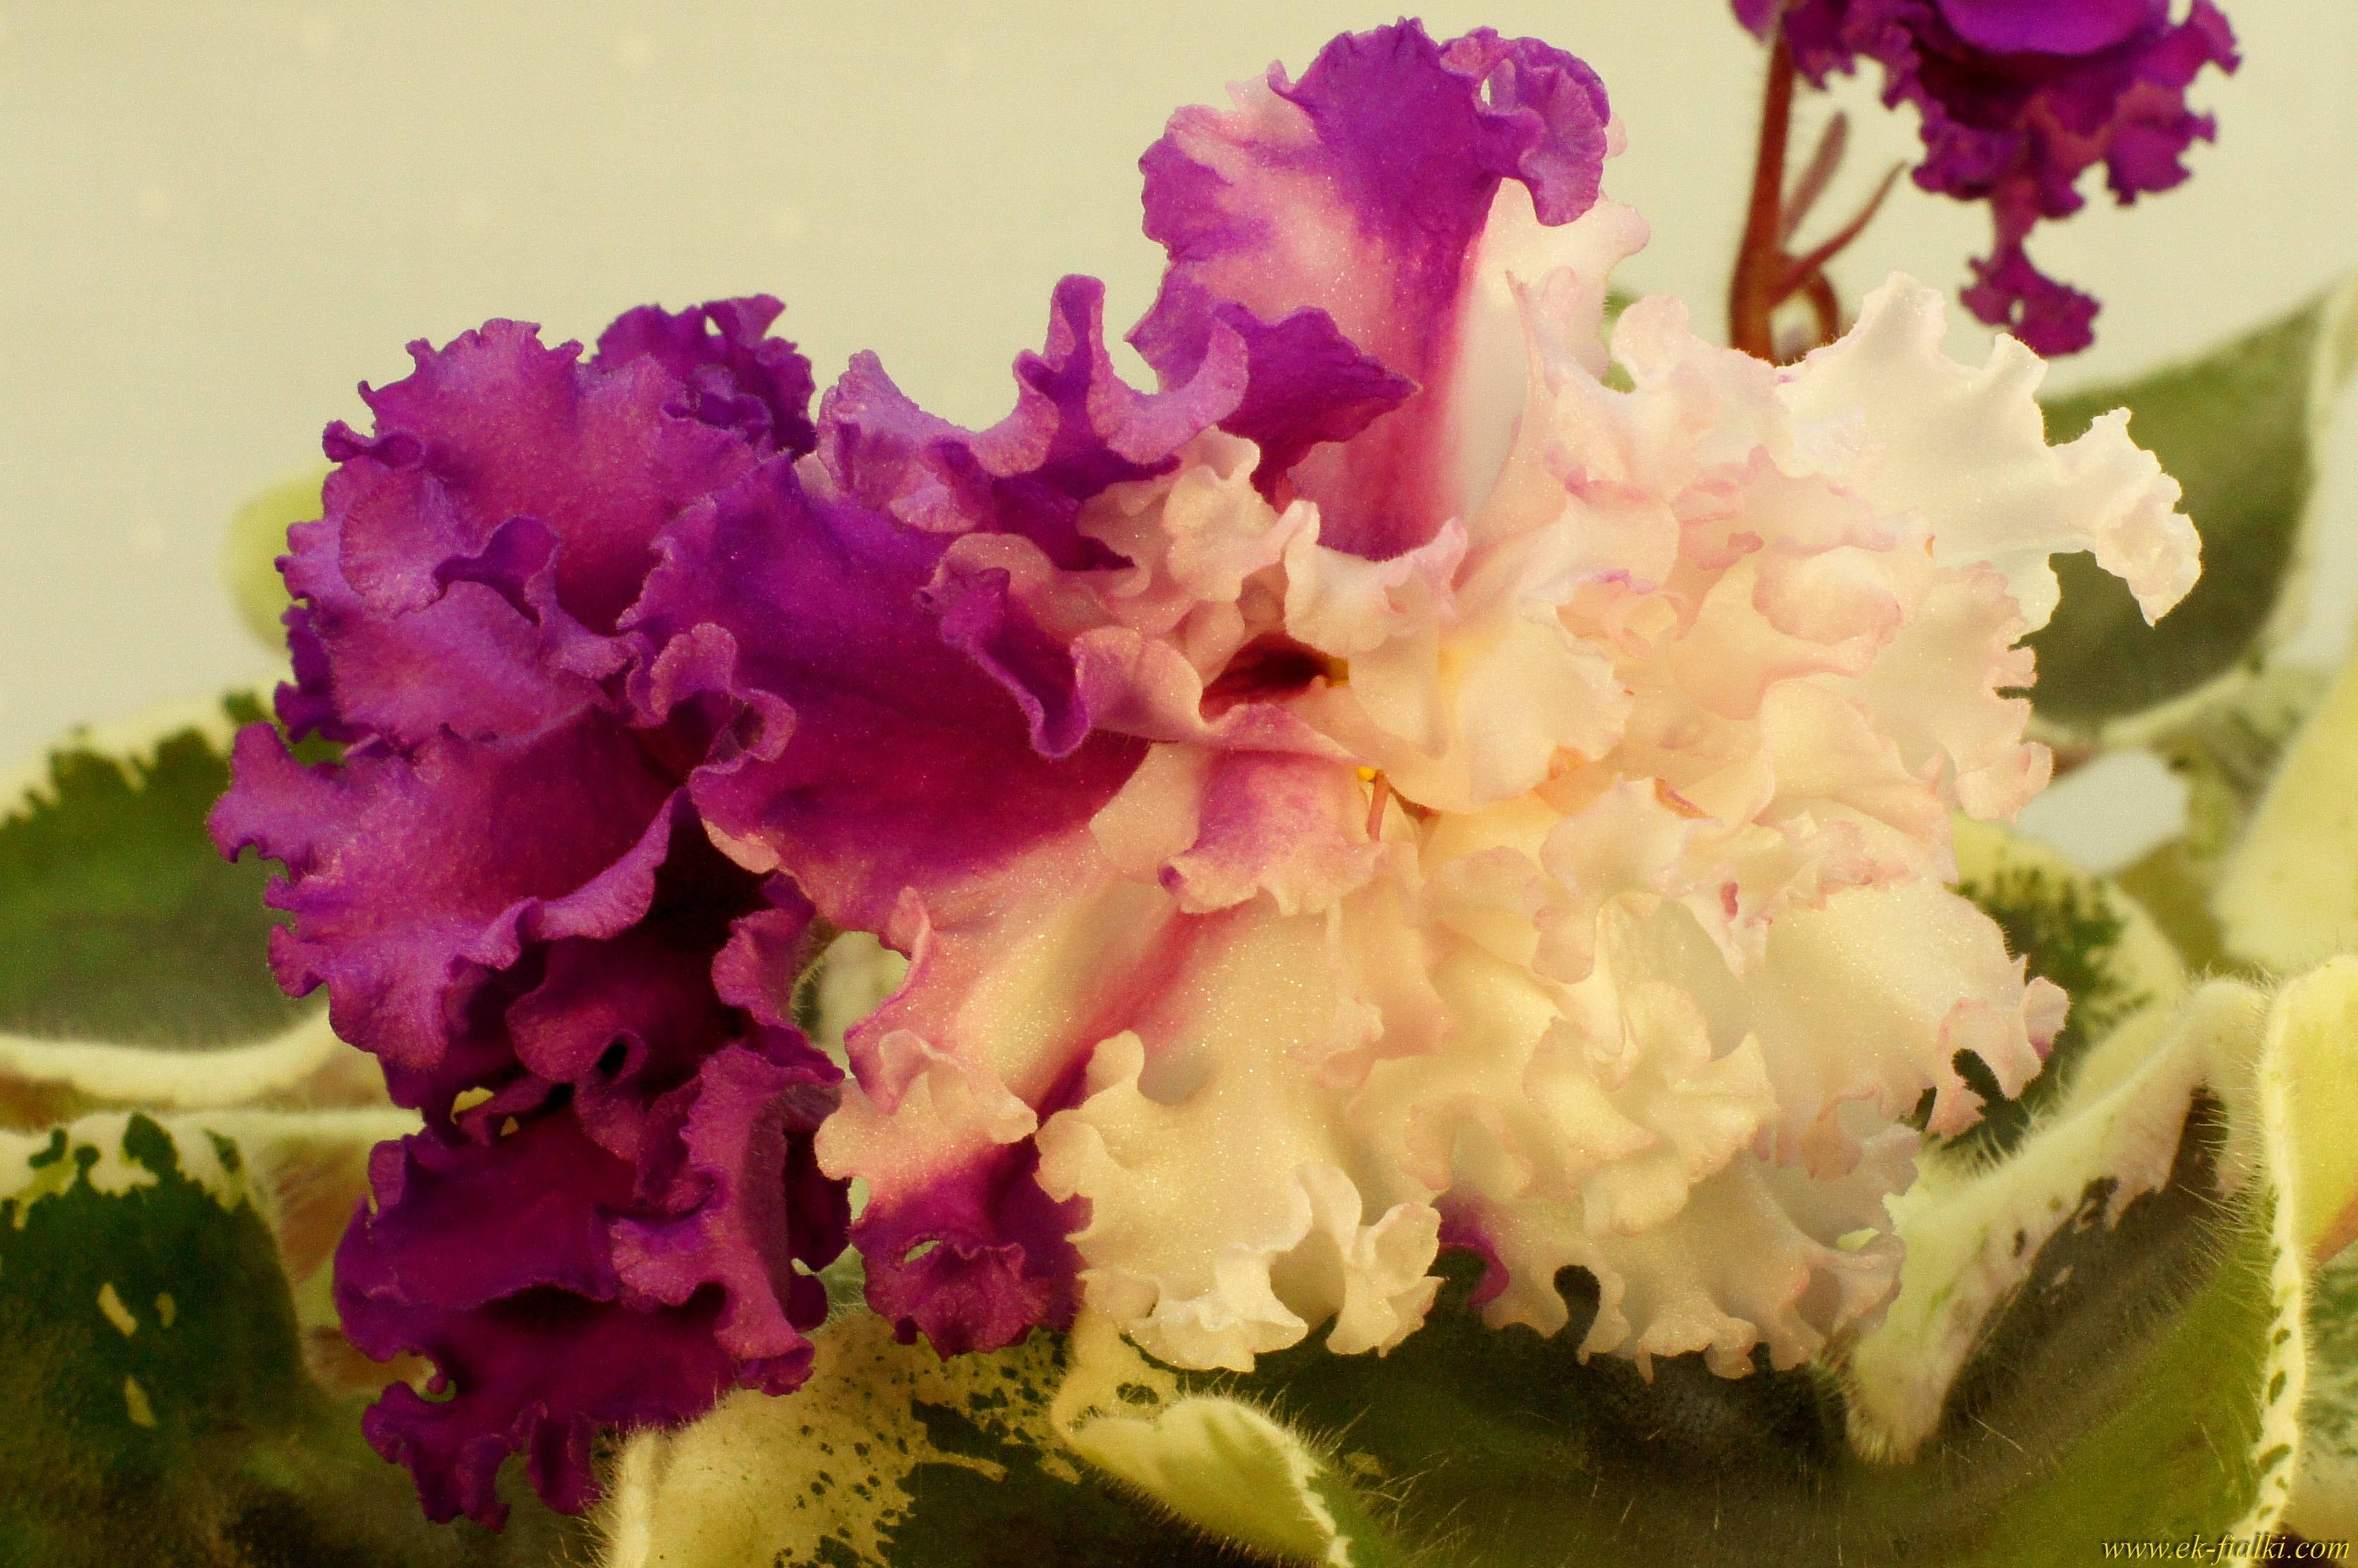 Фиалка ле — описание, разновидности и характеристики сортов